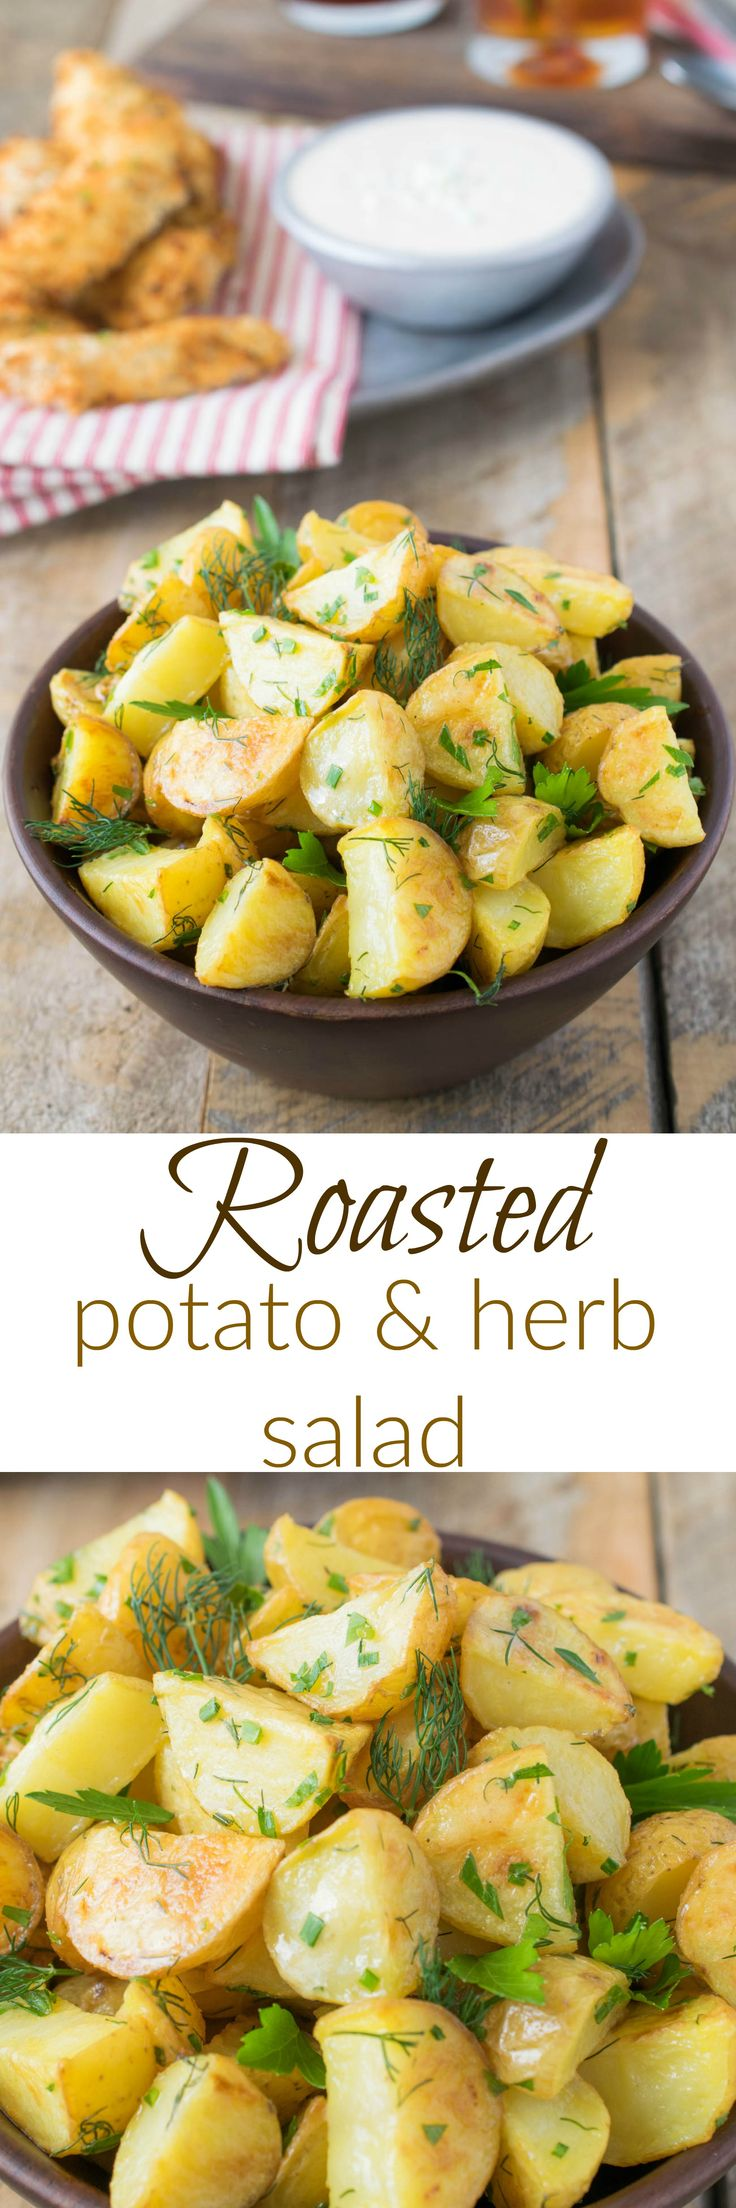 Roasted herb potato salad